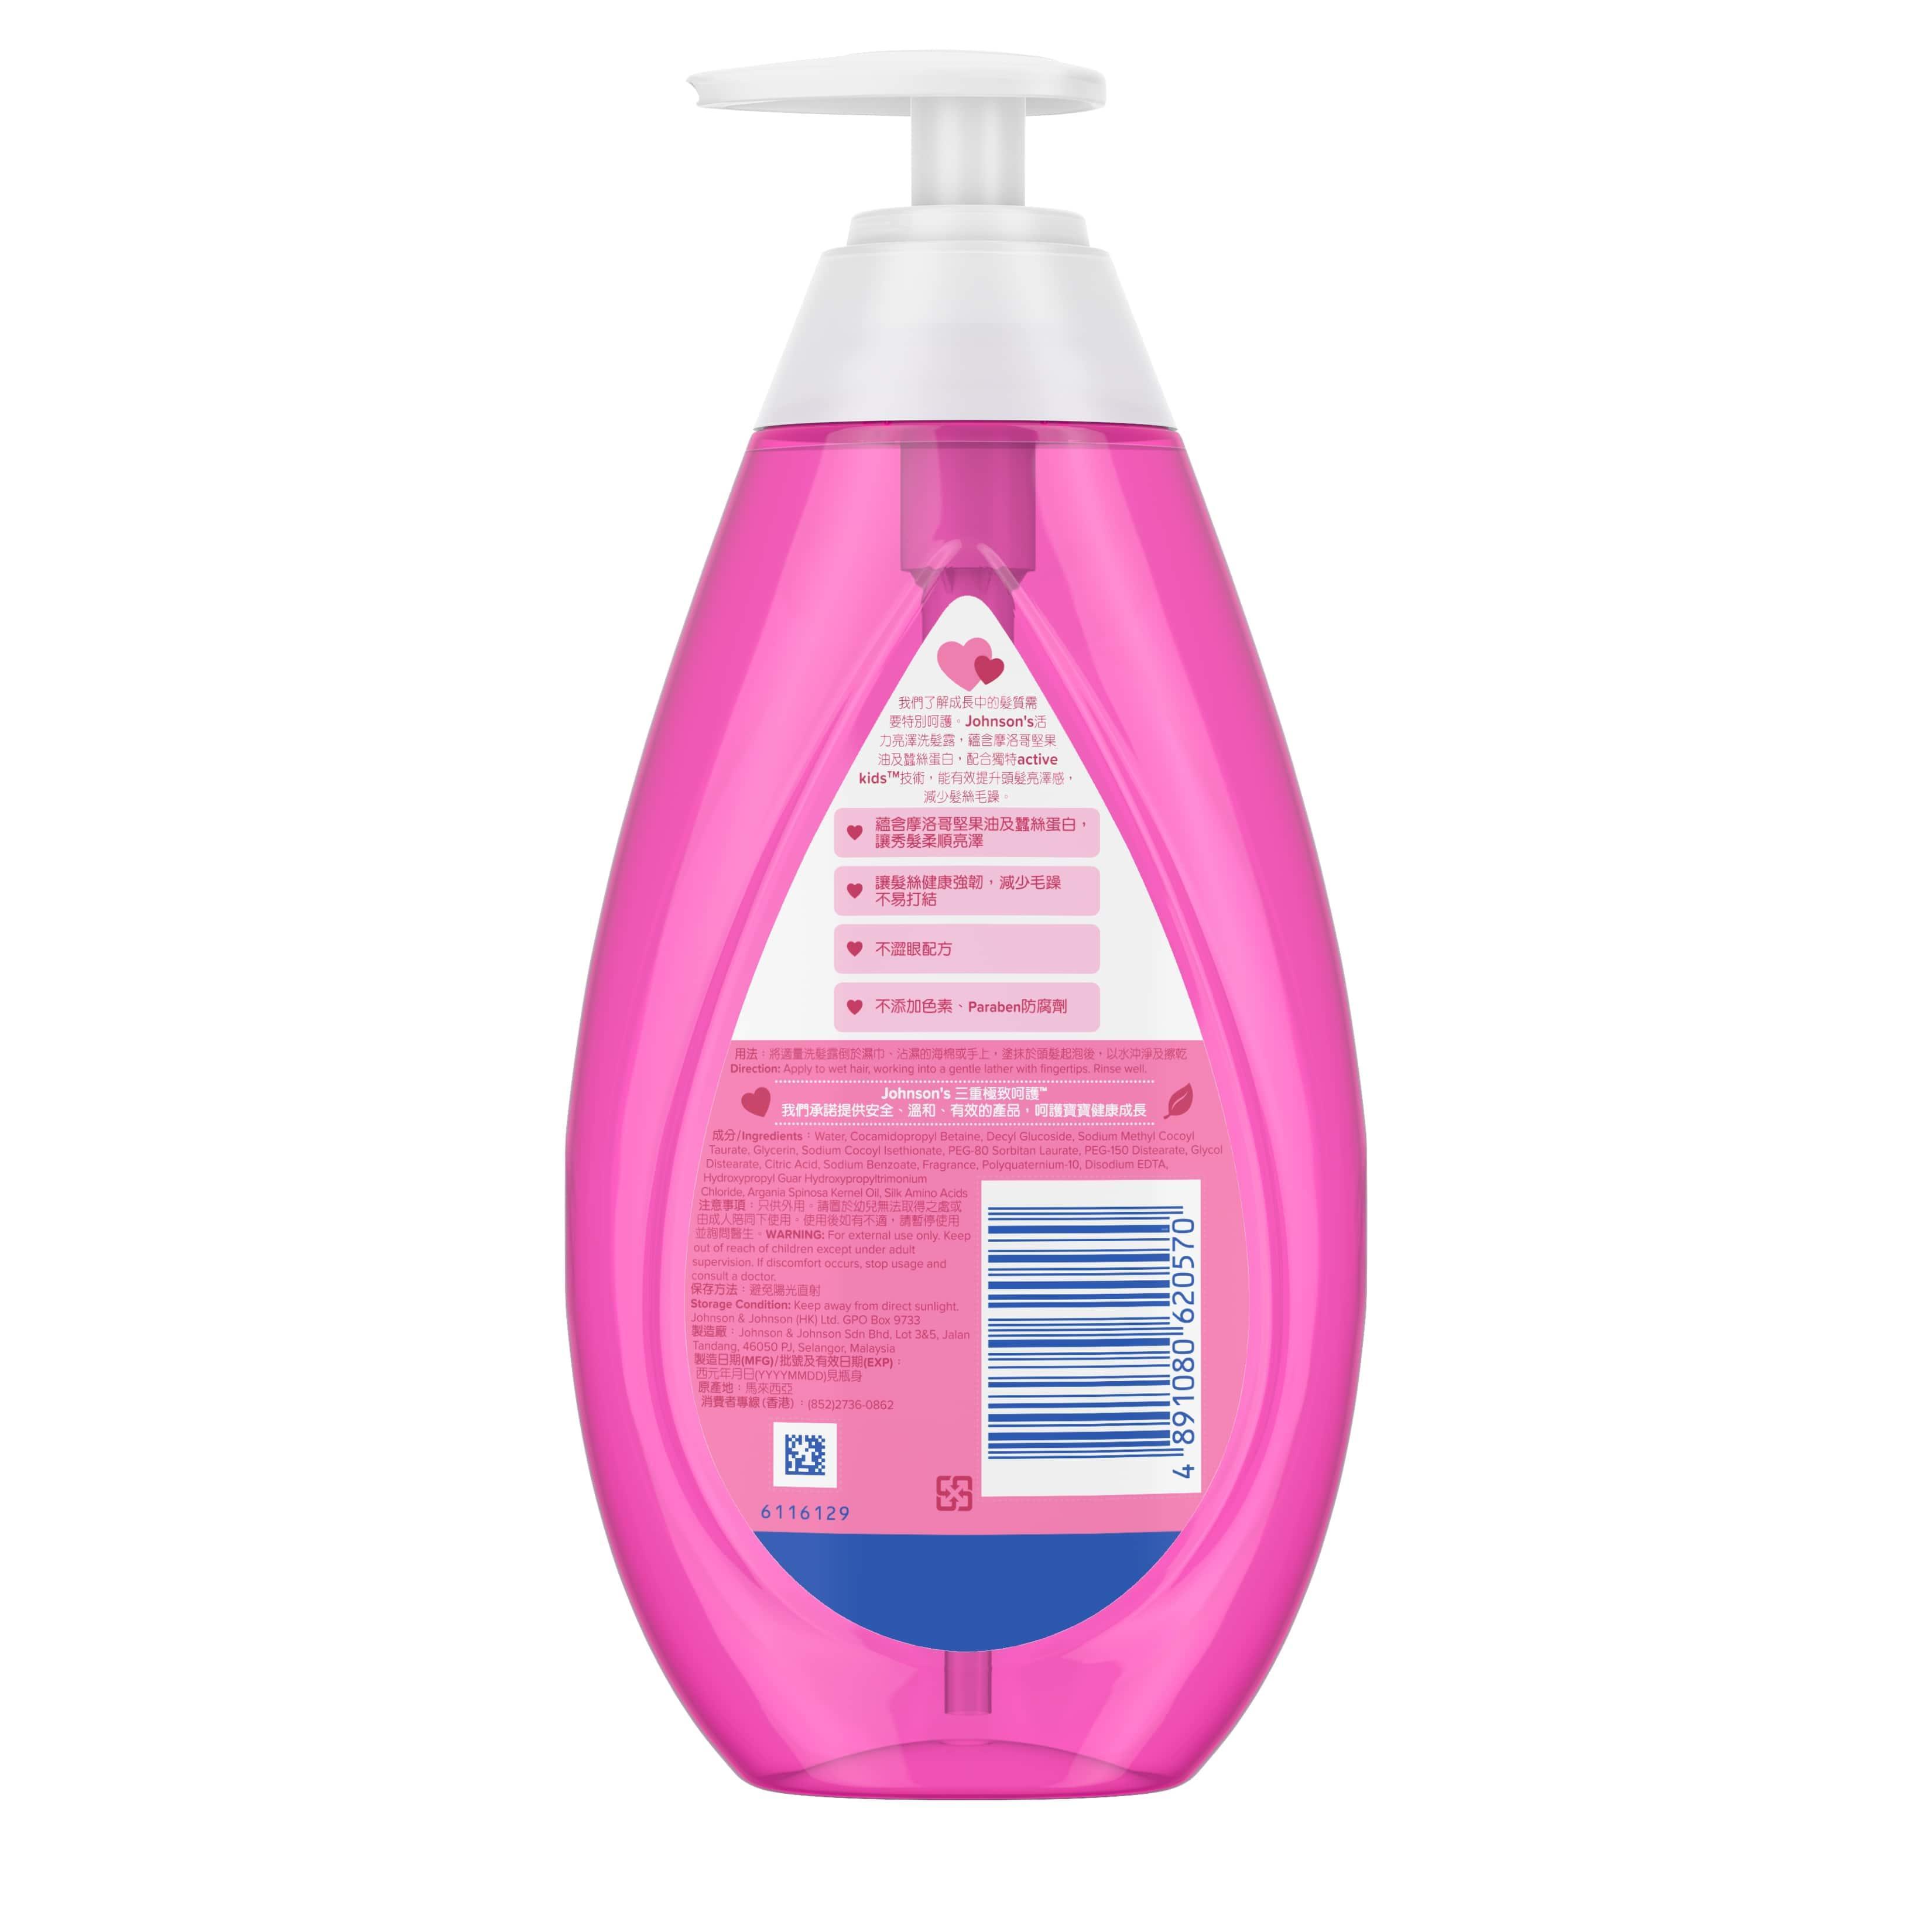 active-kids-shiny-drops-shampoo-500ml-back.jpg